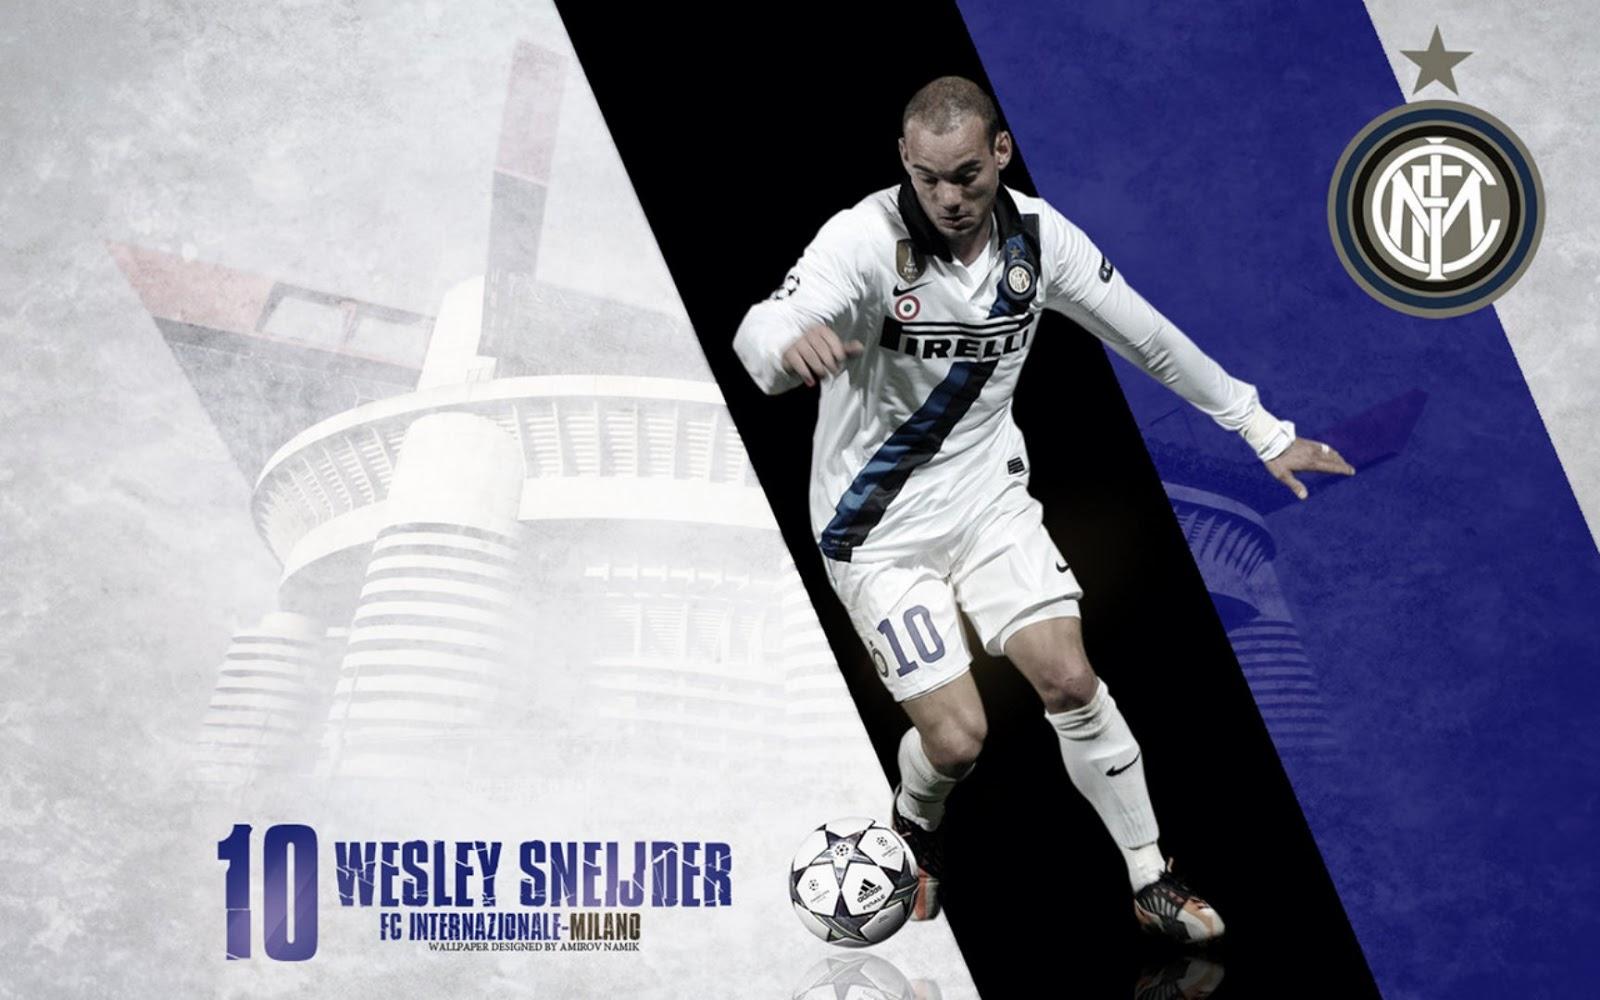 wesley+sneijder+galatasaray+resimleri+rooteto+15 Wesley Sneijder Galatasaray HD Resimleri